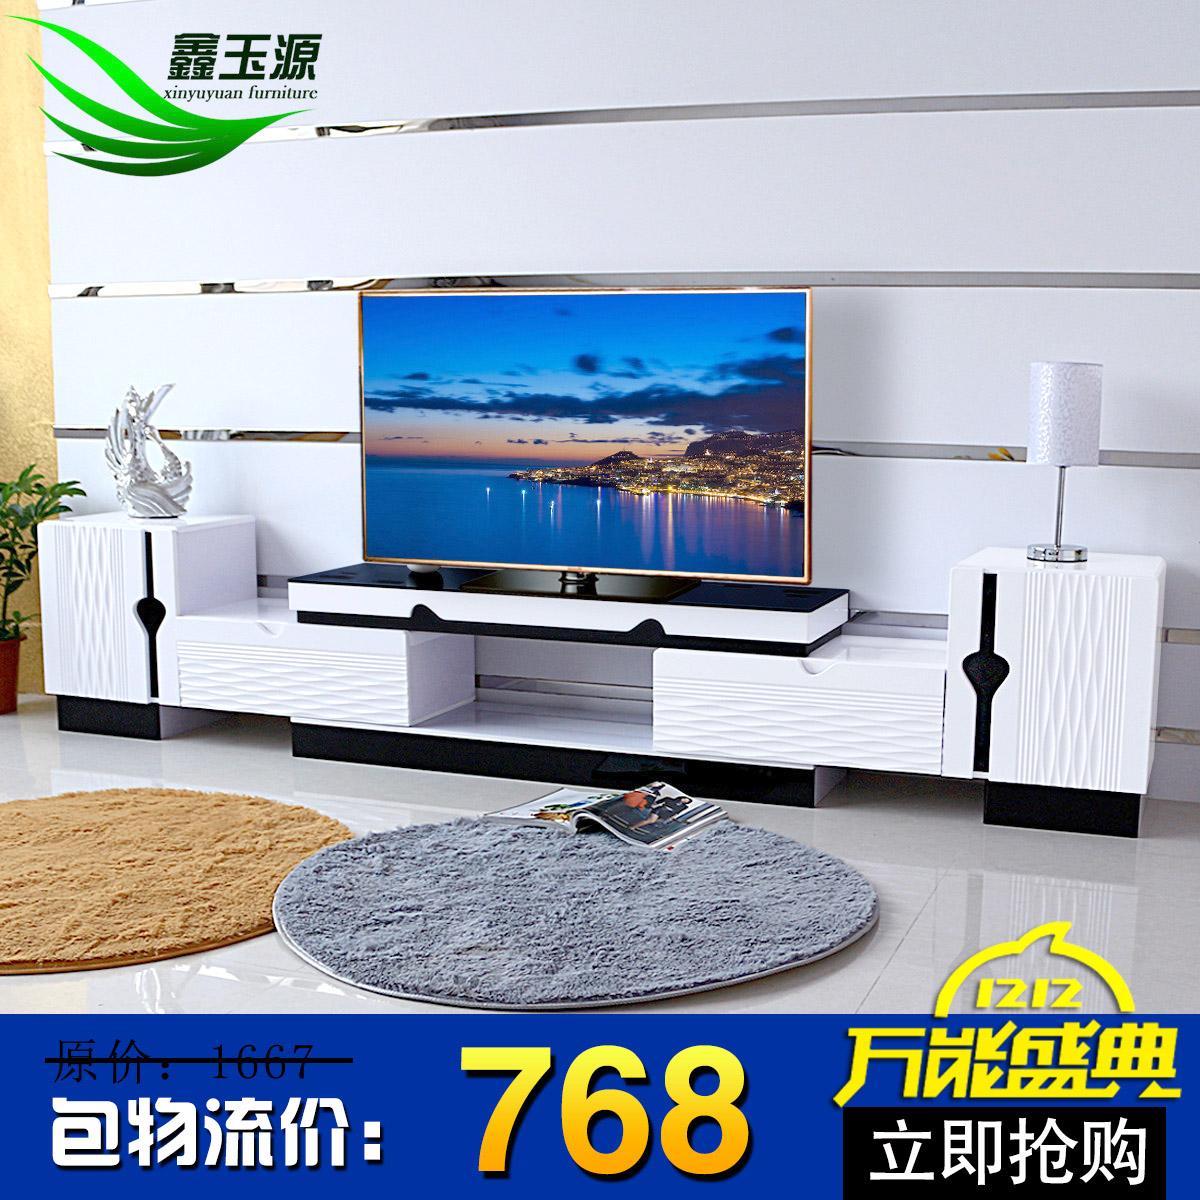 тумба под телевизор Xin Yu Yuan furniture/Mel женский пуховик xin yu 001